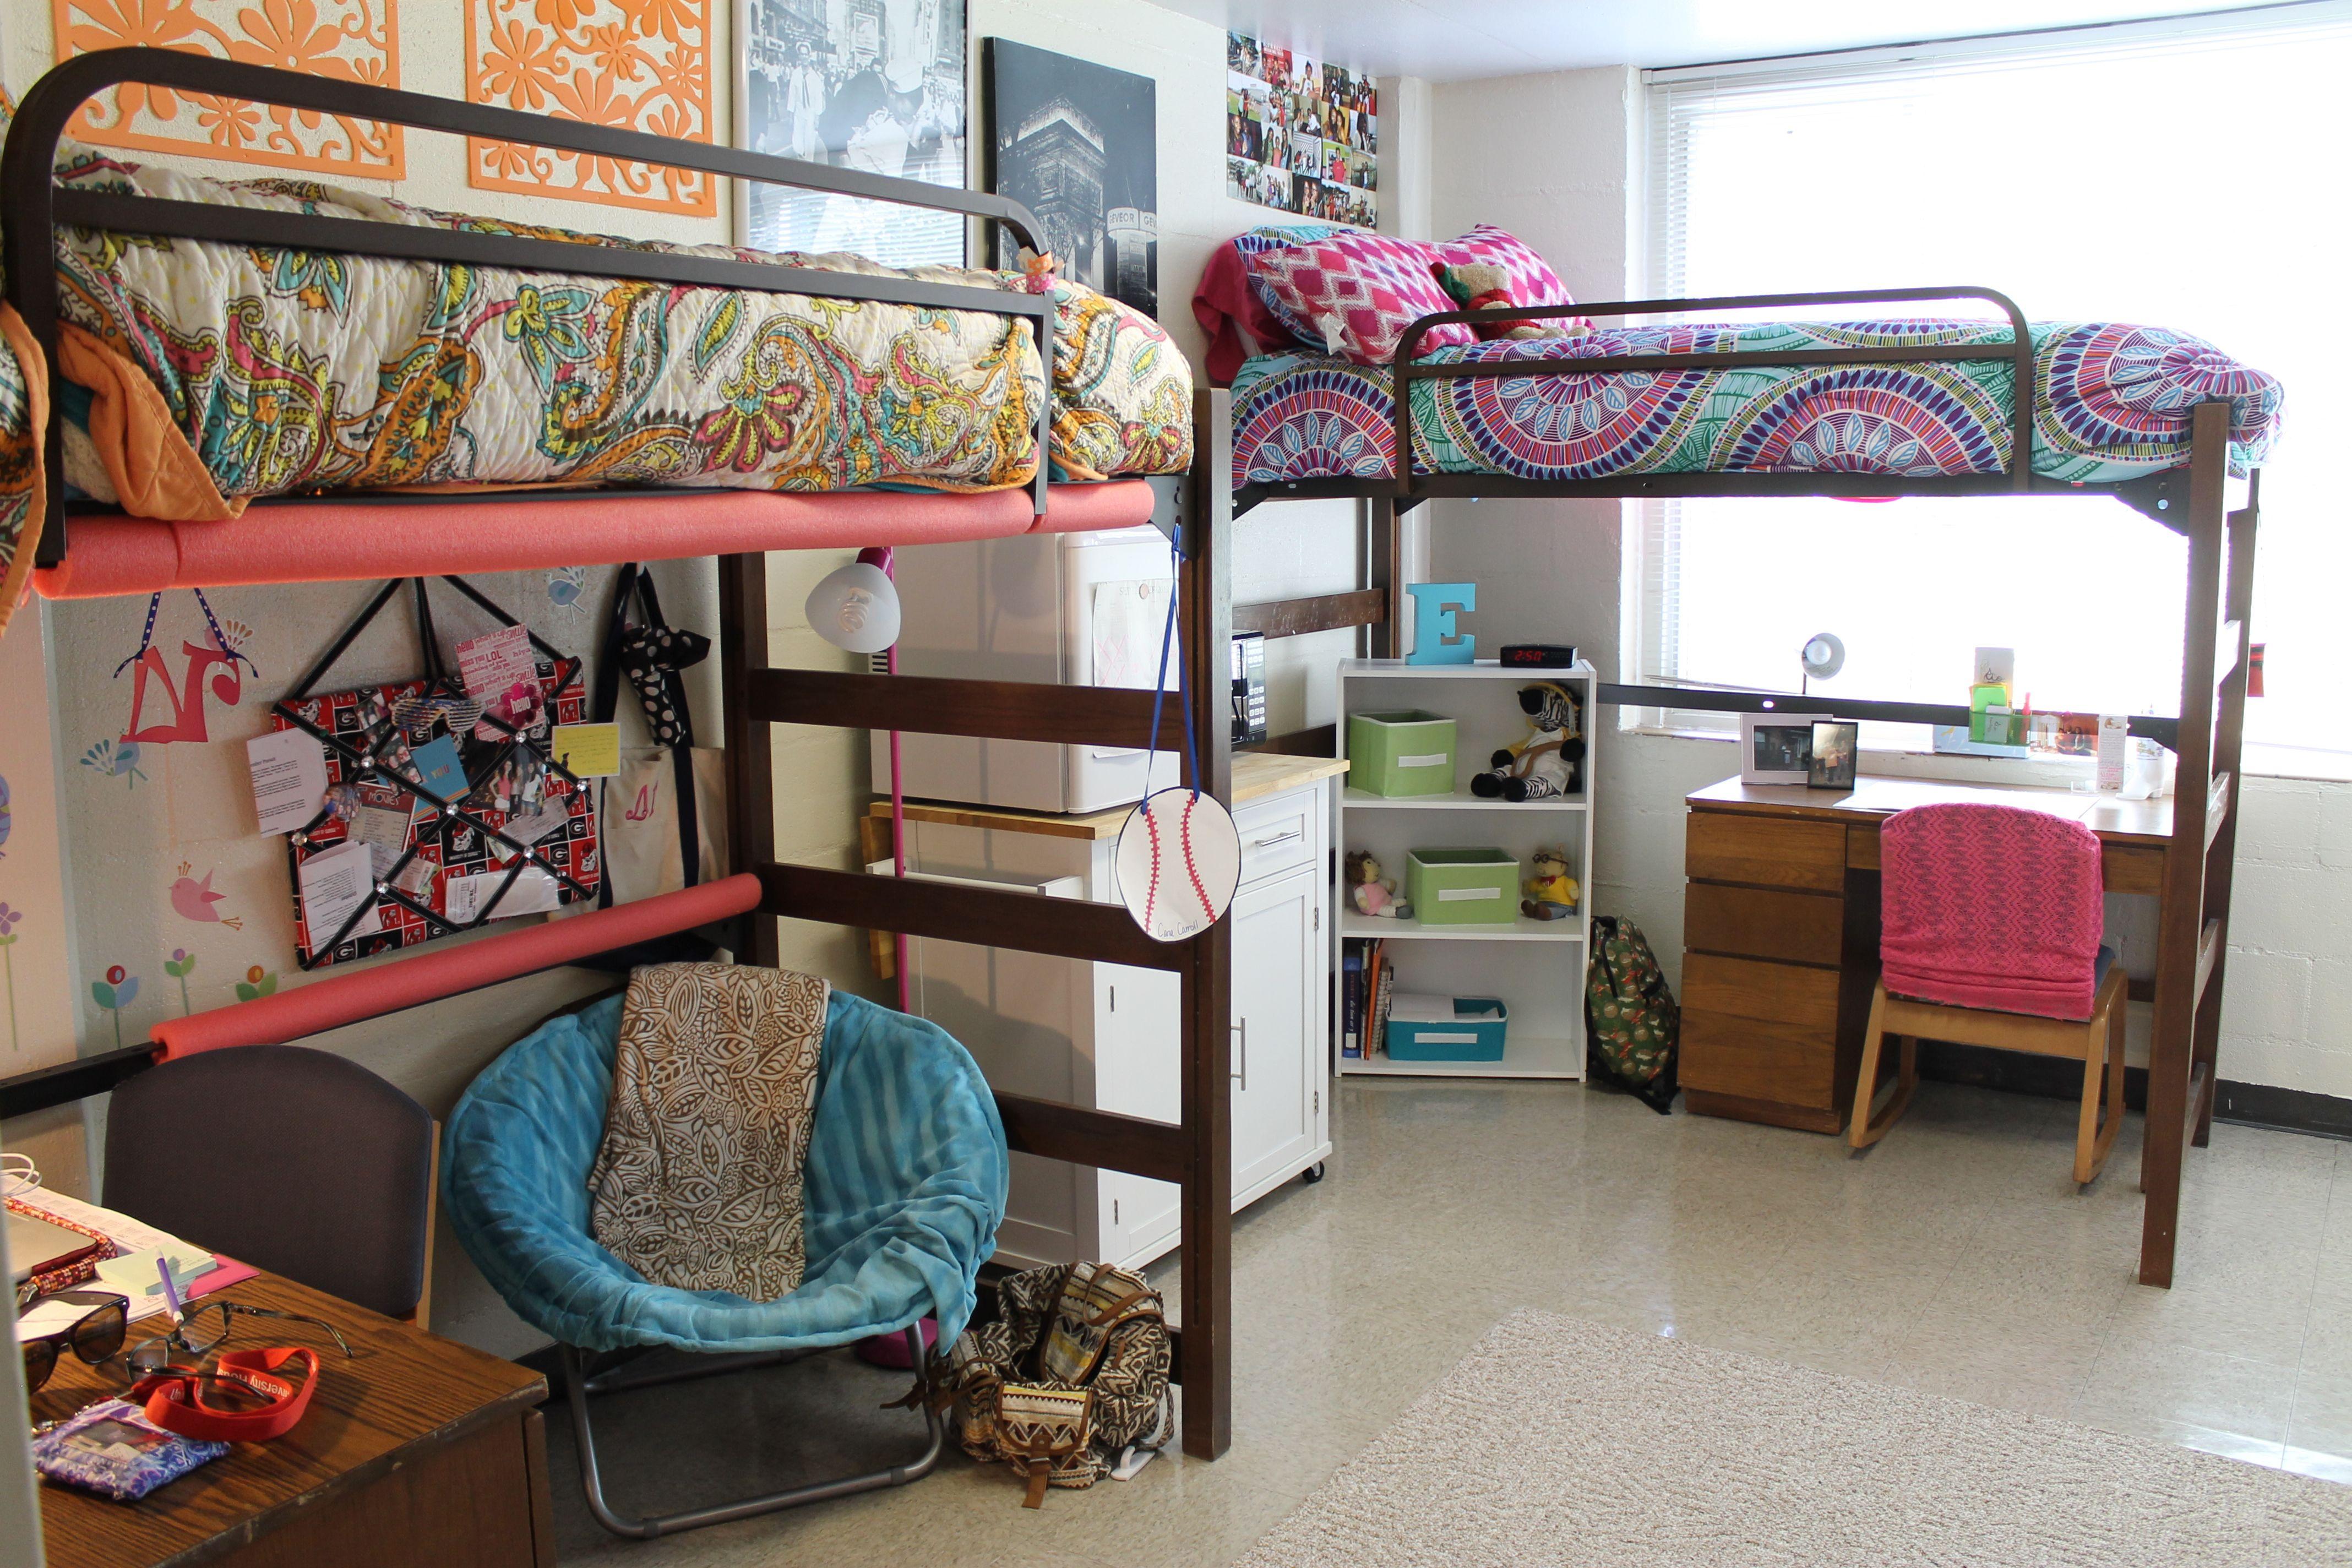 Dorm room loft bed ideas  My dorm room  UGA  Dorm Room Ideas  Pinterest  Dorm room Dorm